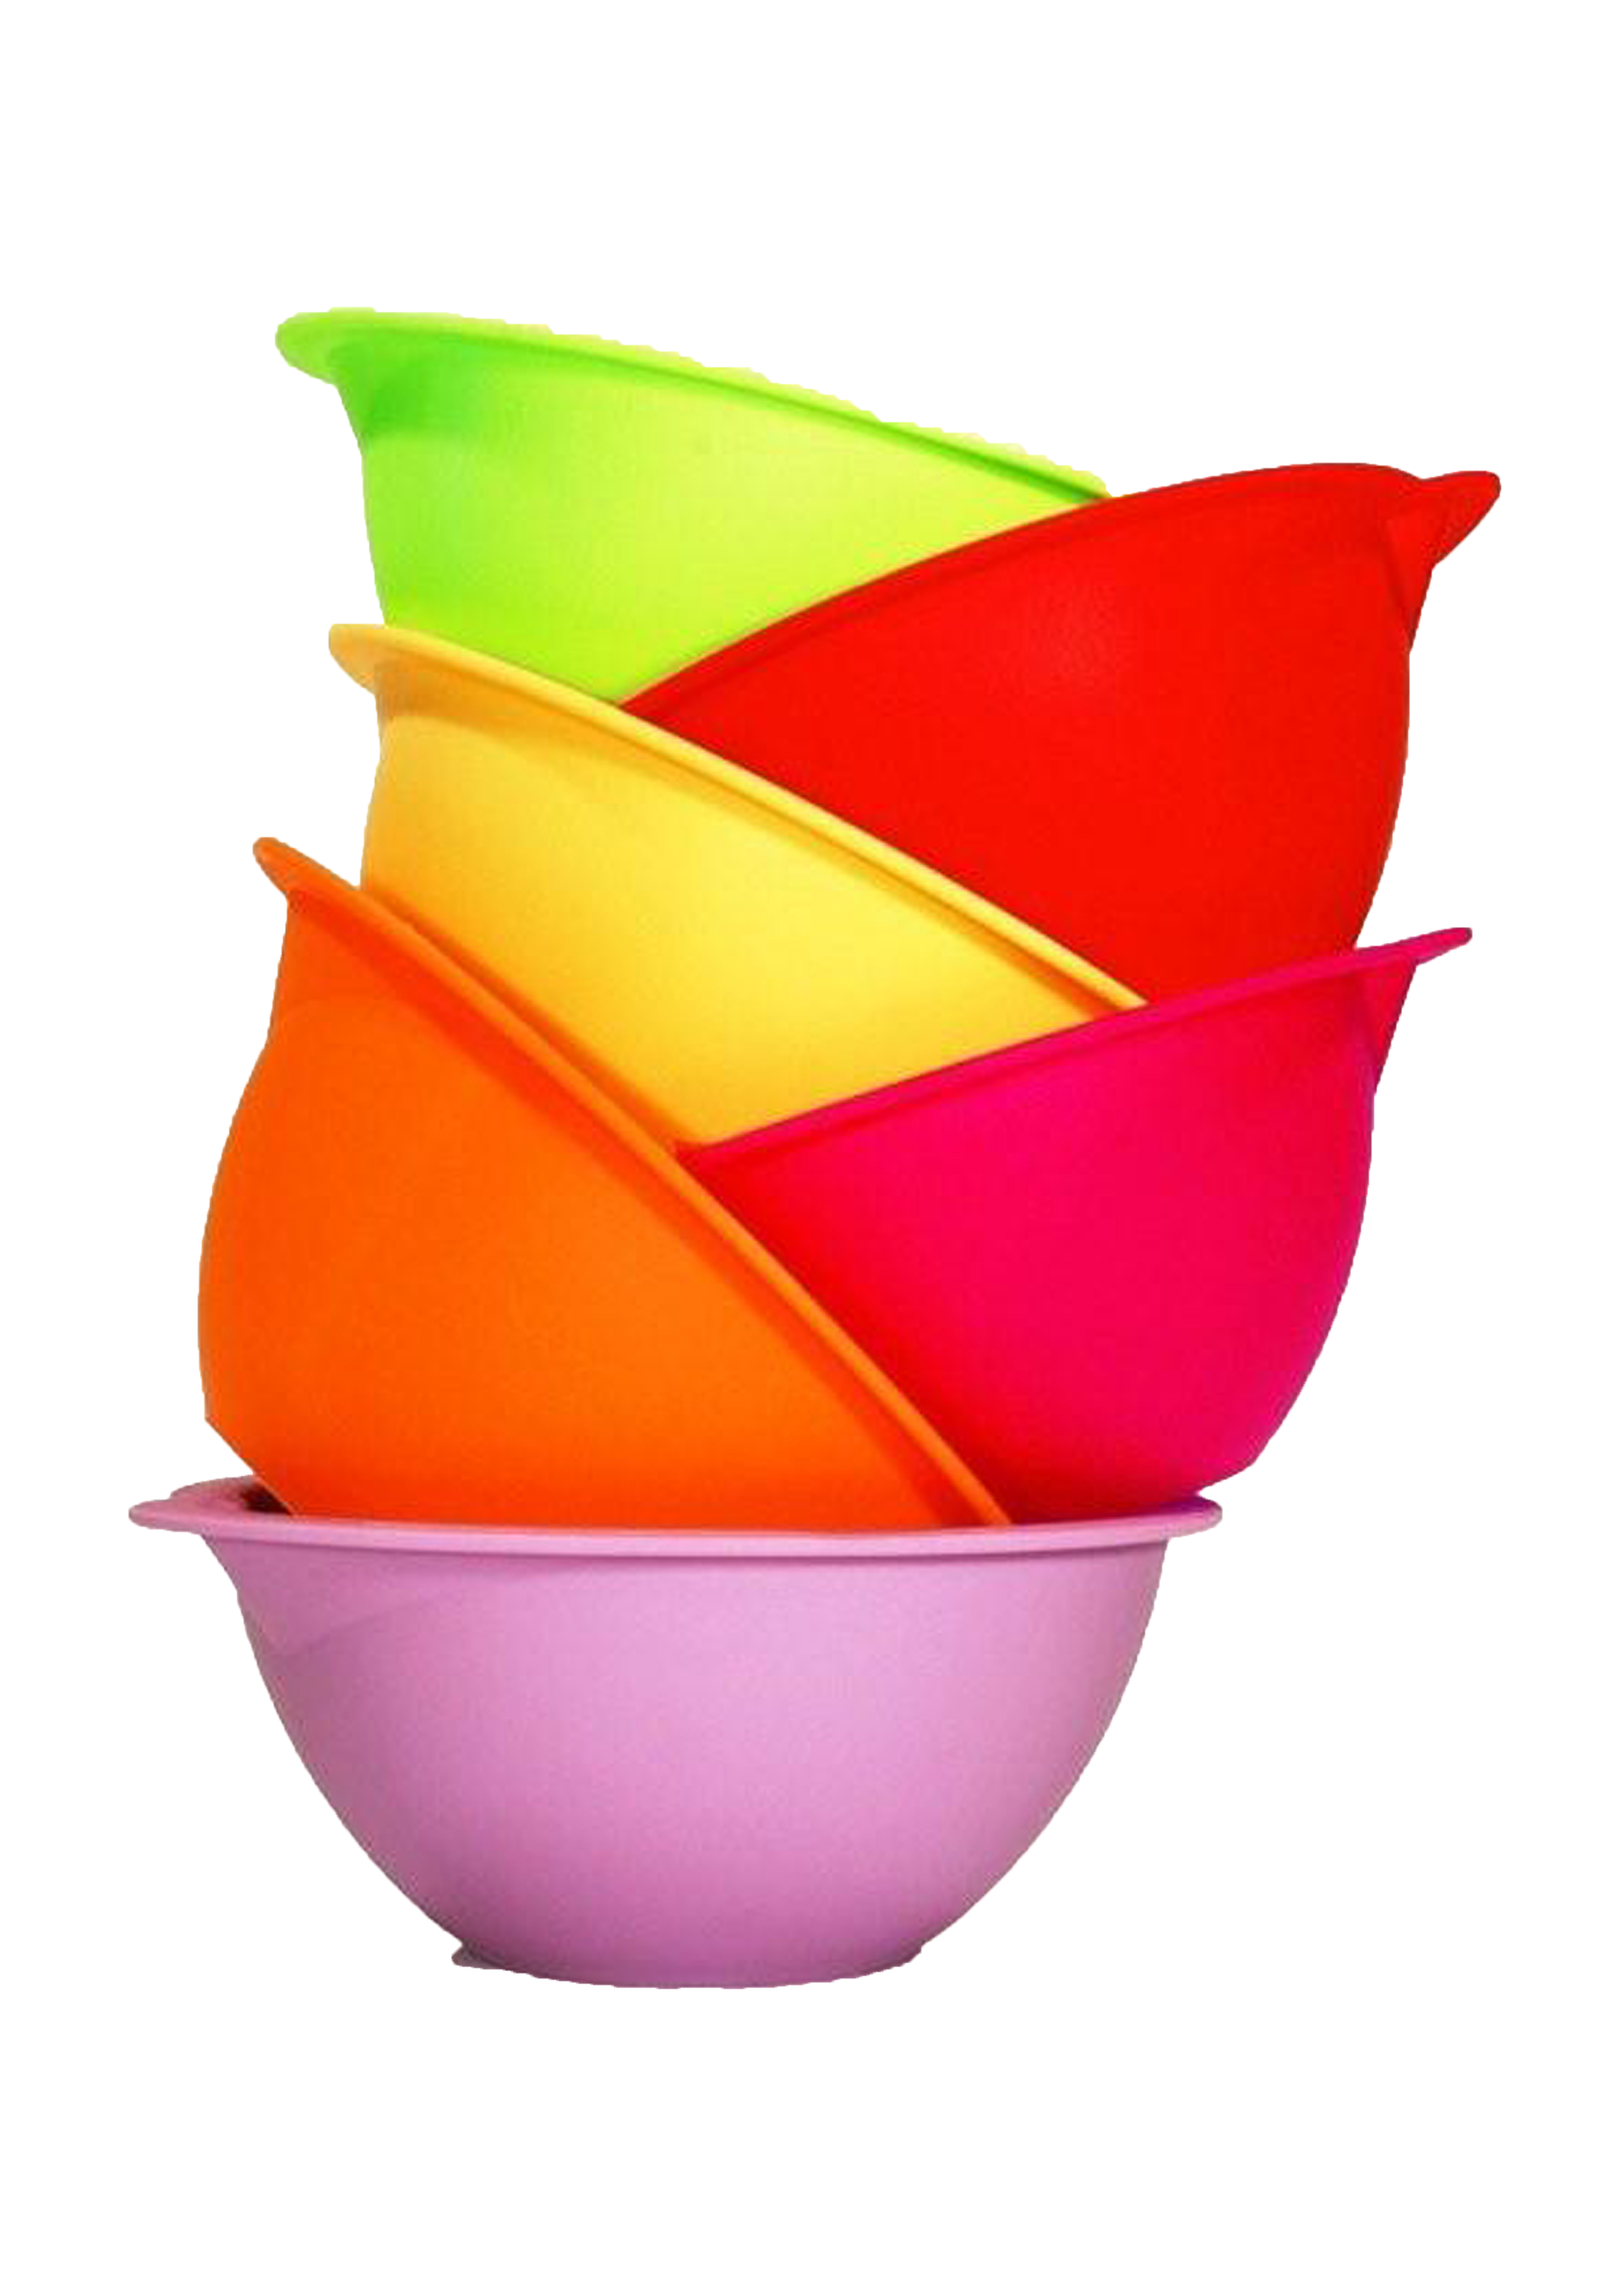 http://www.laris.com.br/bowl-amor-cor-p1603/